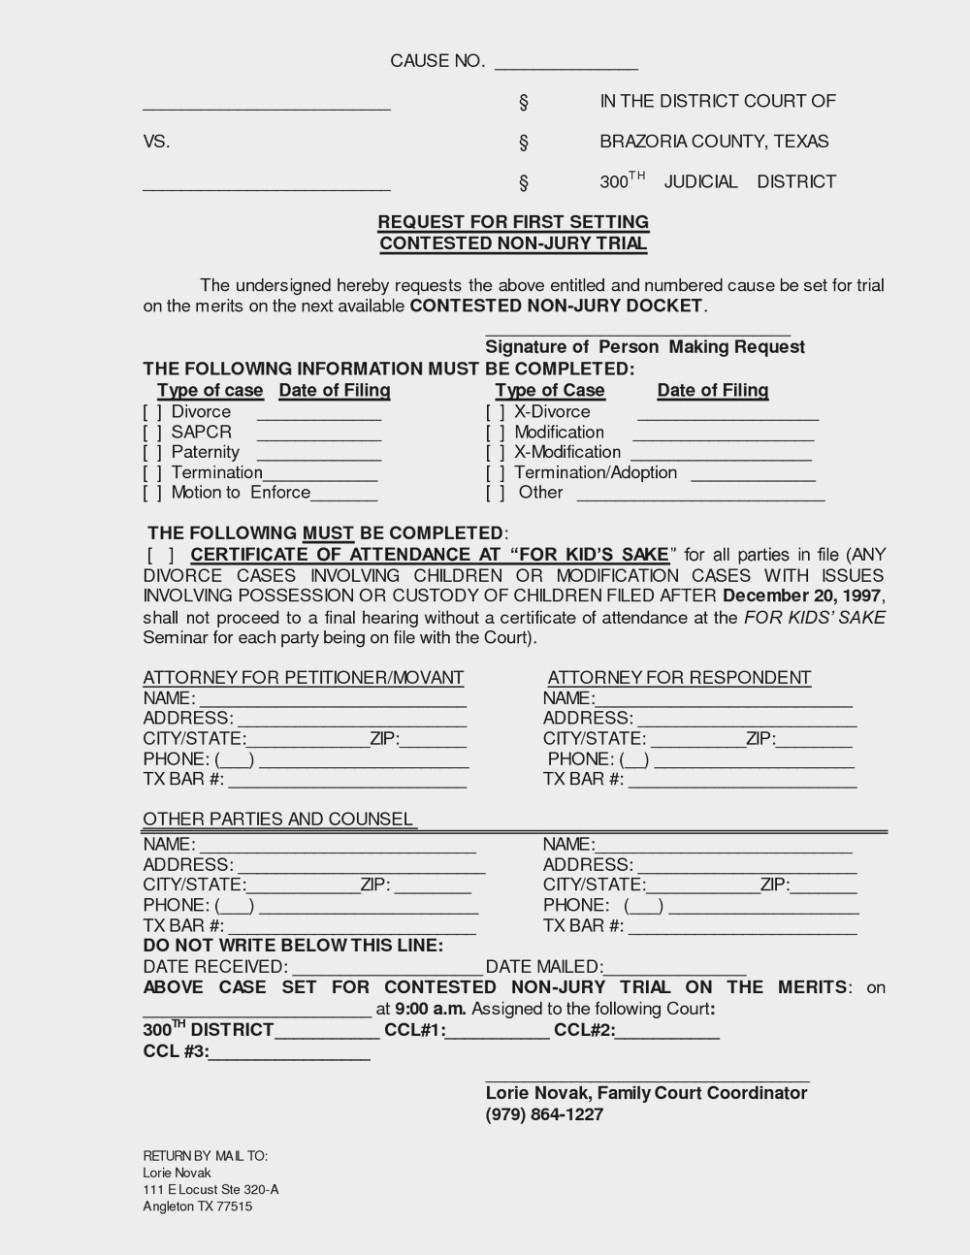 Divorce Papers Louisiana Best Of 30 Free Uncontested Divorce Forms - Free Printable Divorce Papers For Louisiana